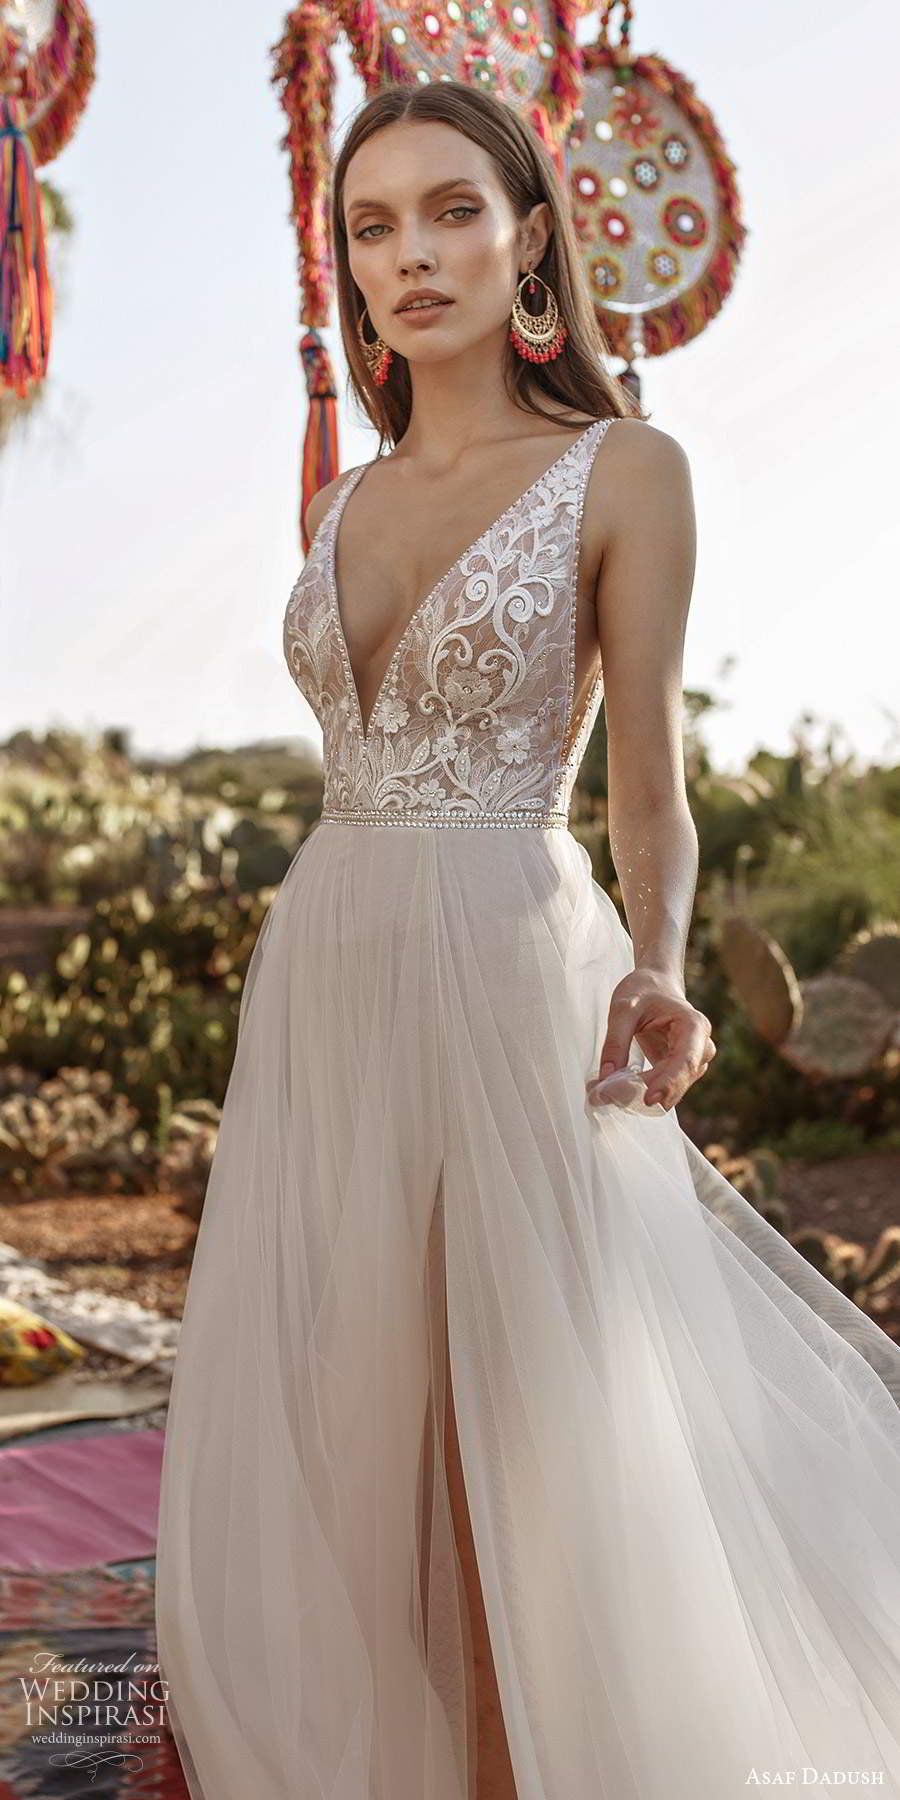 asaf dadush 2020 bridal sleeveless straps plunging v neckline heavily embellished bodice a line ball gown wedding dress v back (10) mv